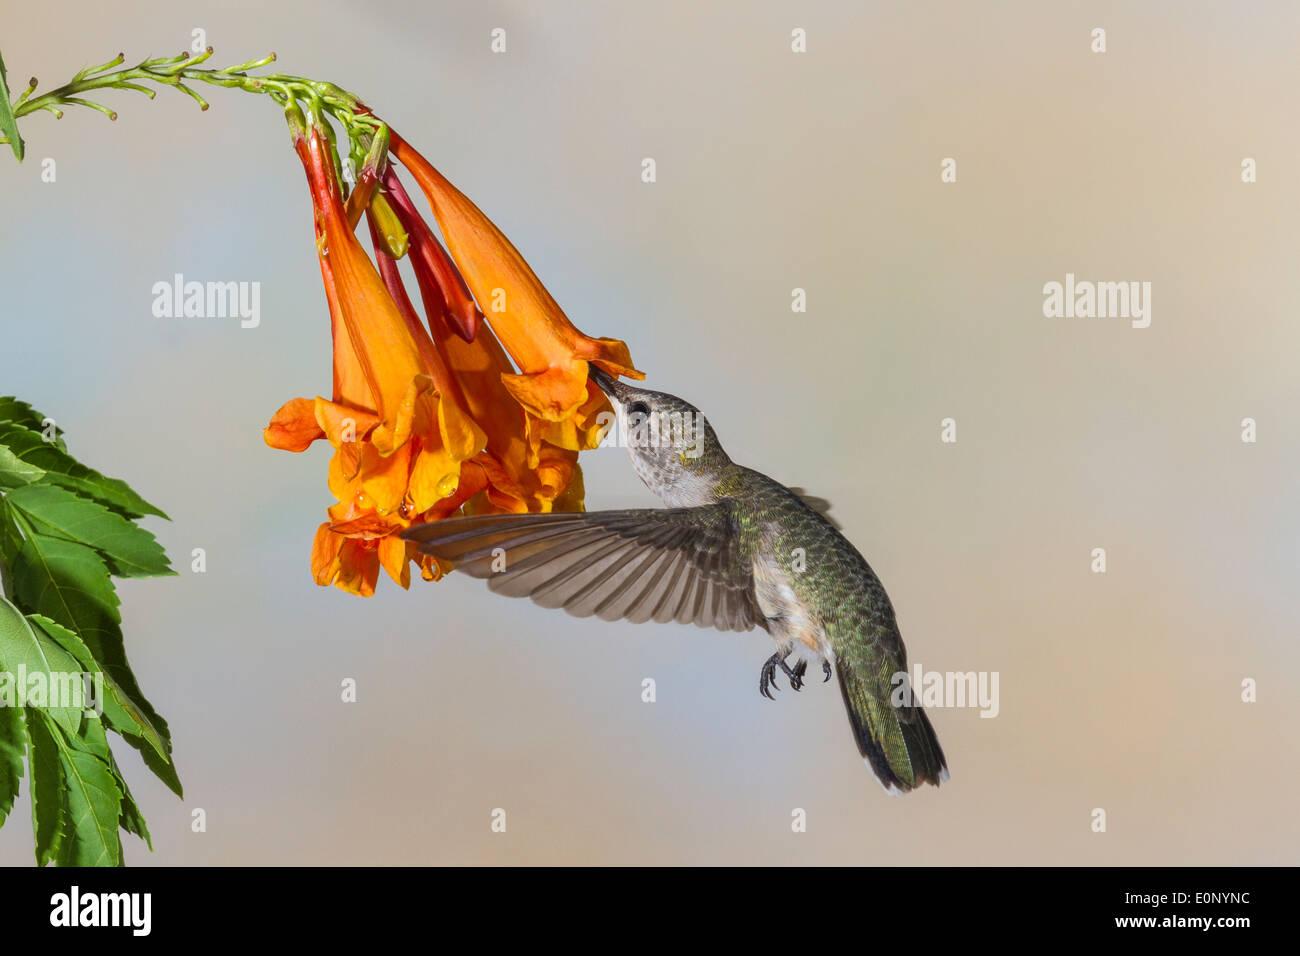 Black-chinned Hummingbird, Archilochus alexandri, feeding on nectar from Honeysuckle flowers. - Stock Image